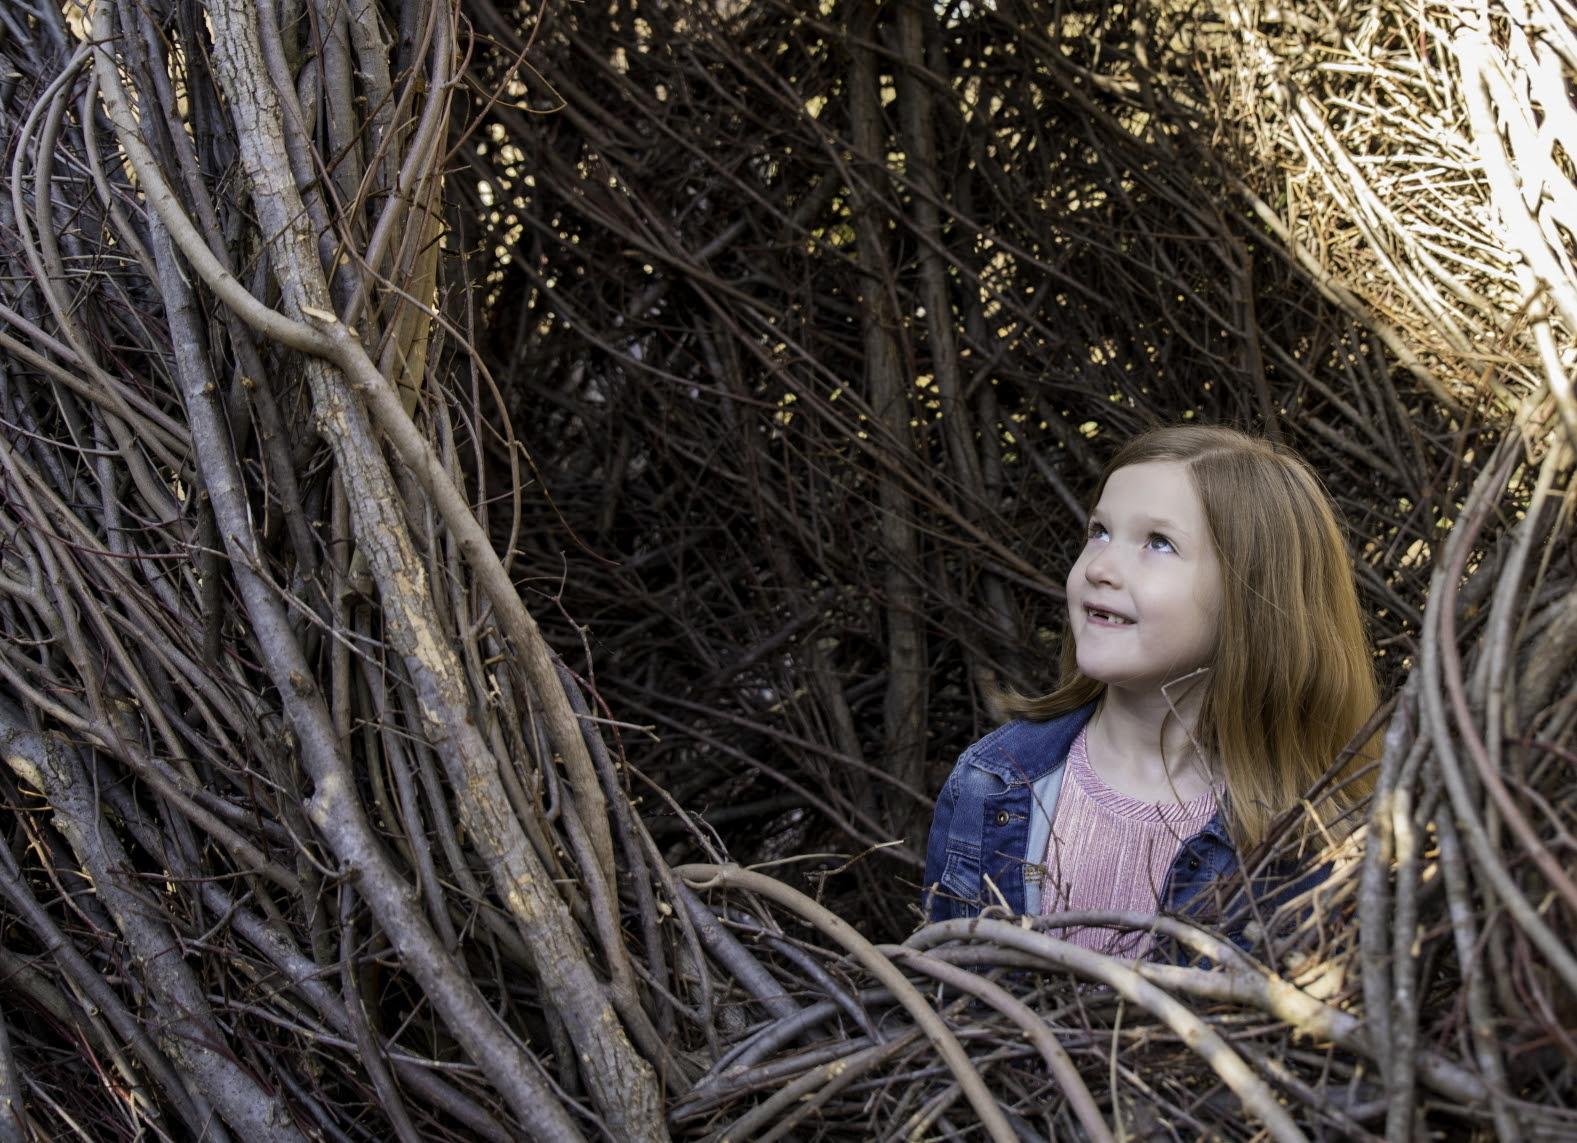 Stickwork exhibit by Patrick Dougherty, Fort Worth Botanic Garden